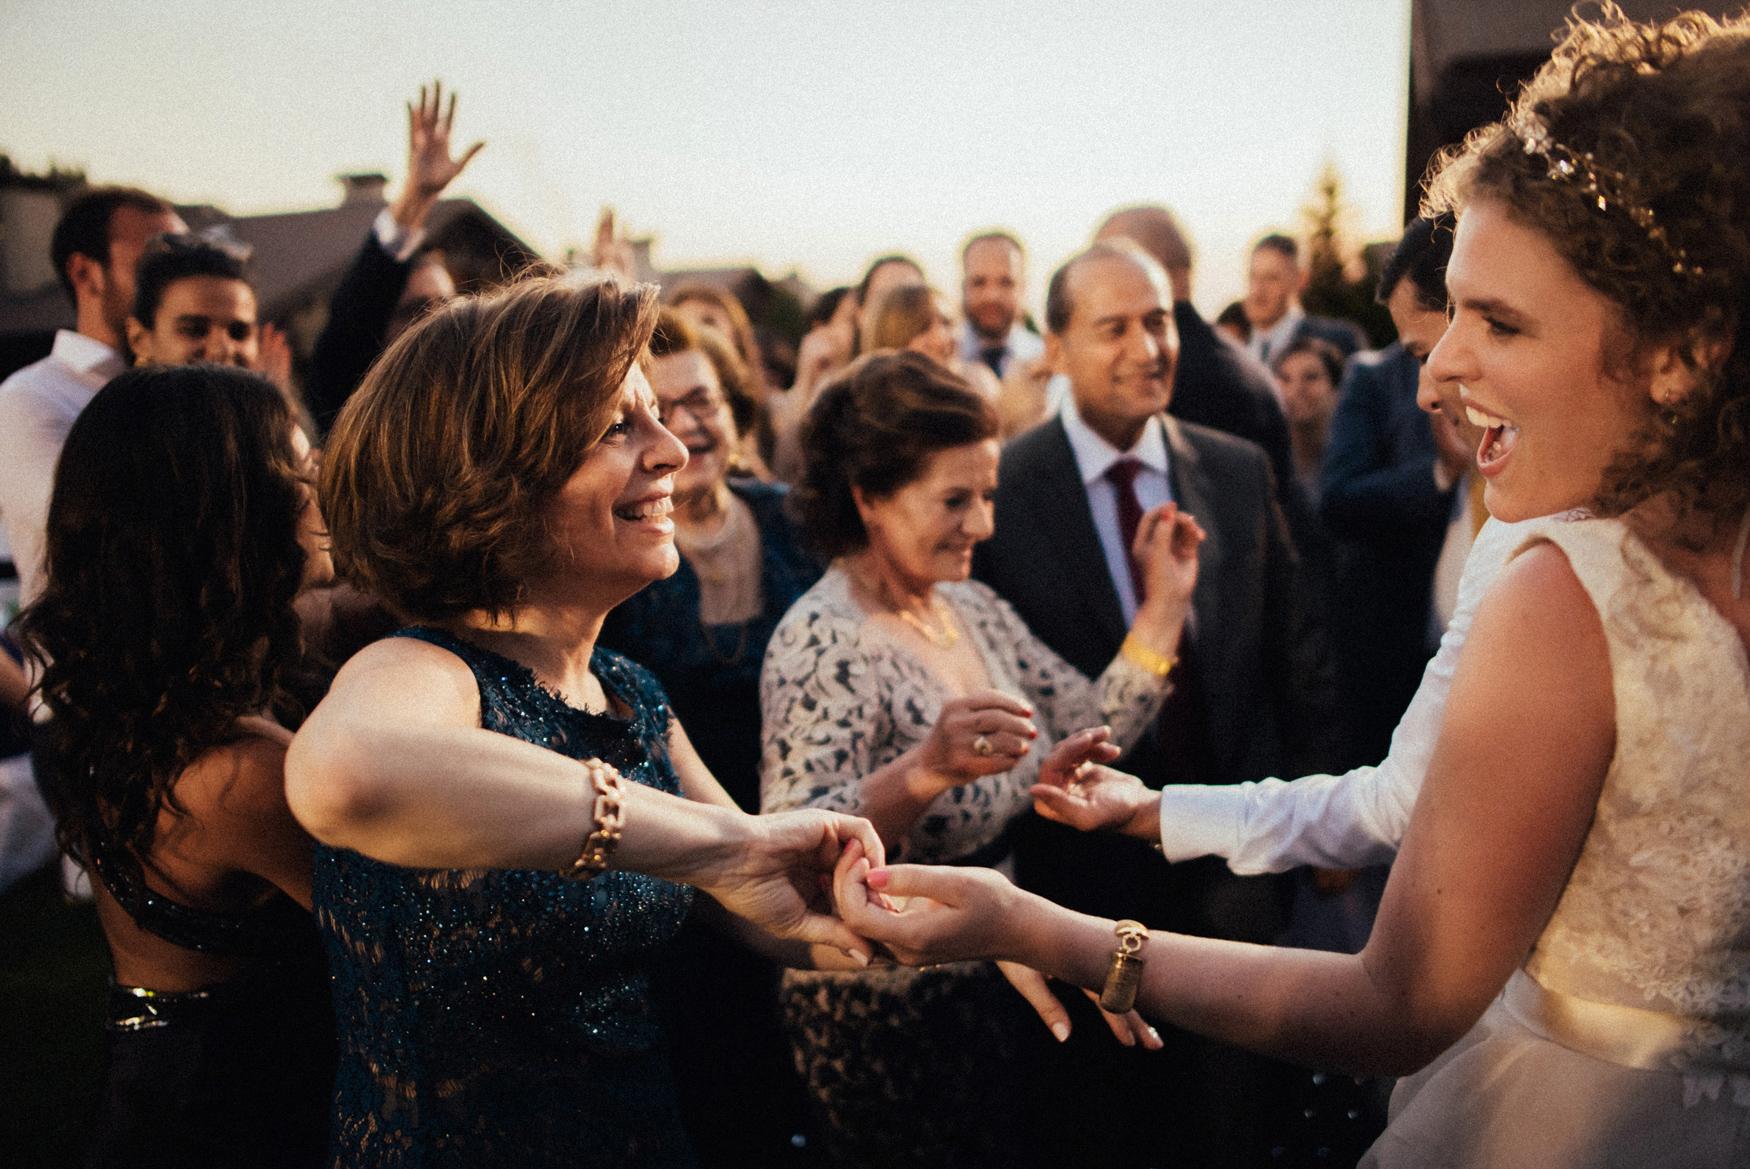 LR5 beirut lebanon mzaar intercontinental wedding photographer 029.jpg